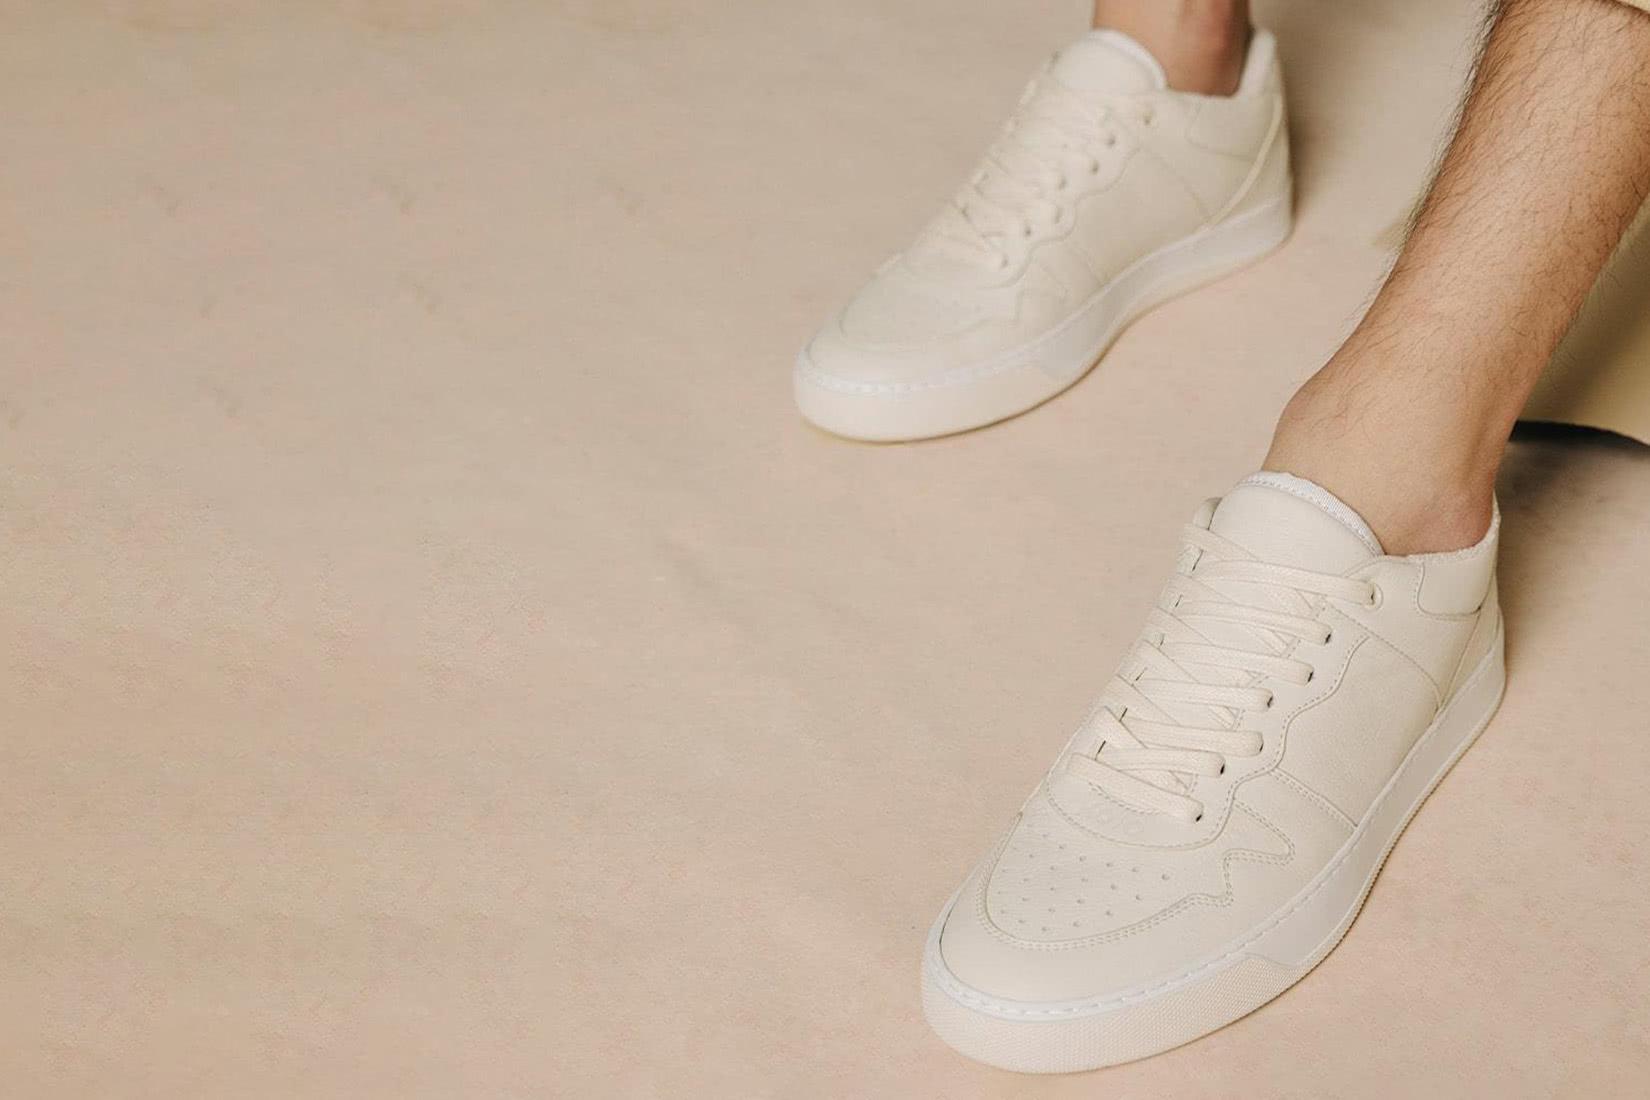 Koio sneakers review metro comfort - Luxe Digital